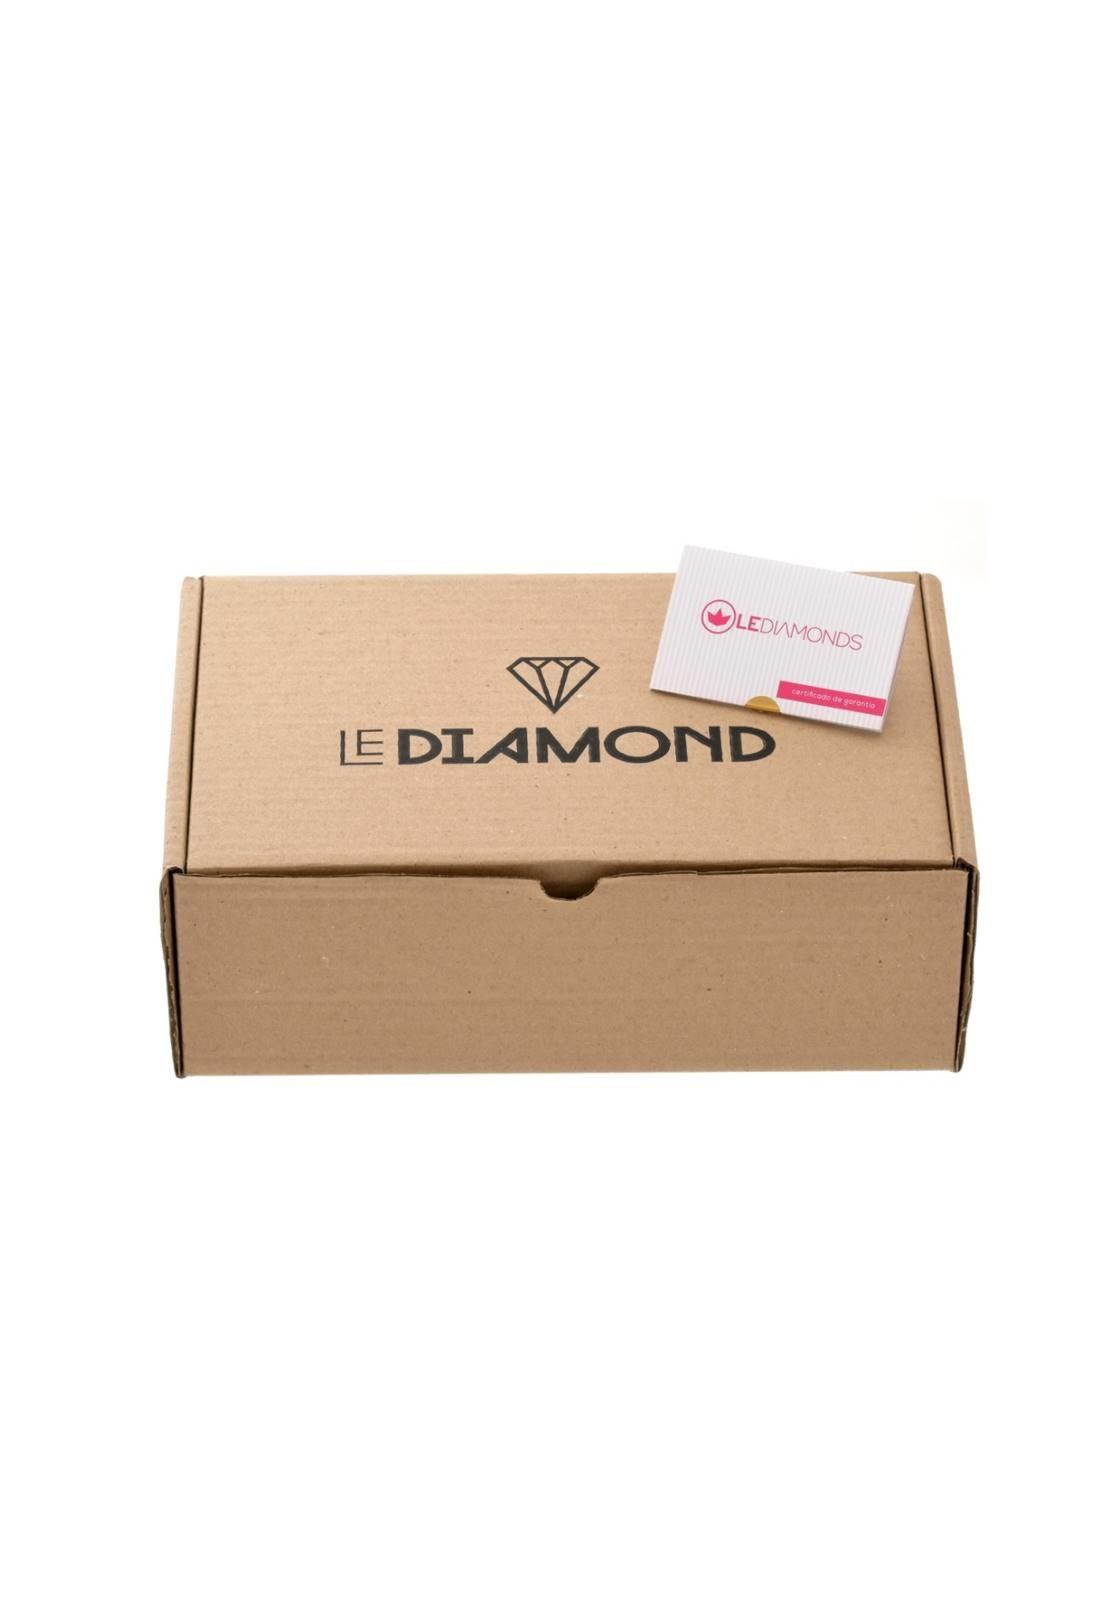 Brinco Le Diamond Base Floral com Pérola